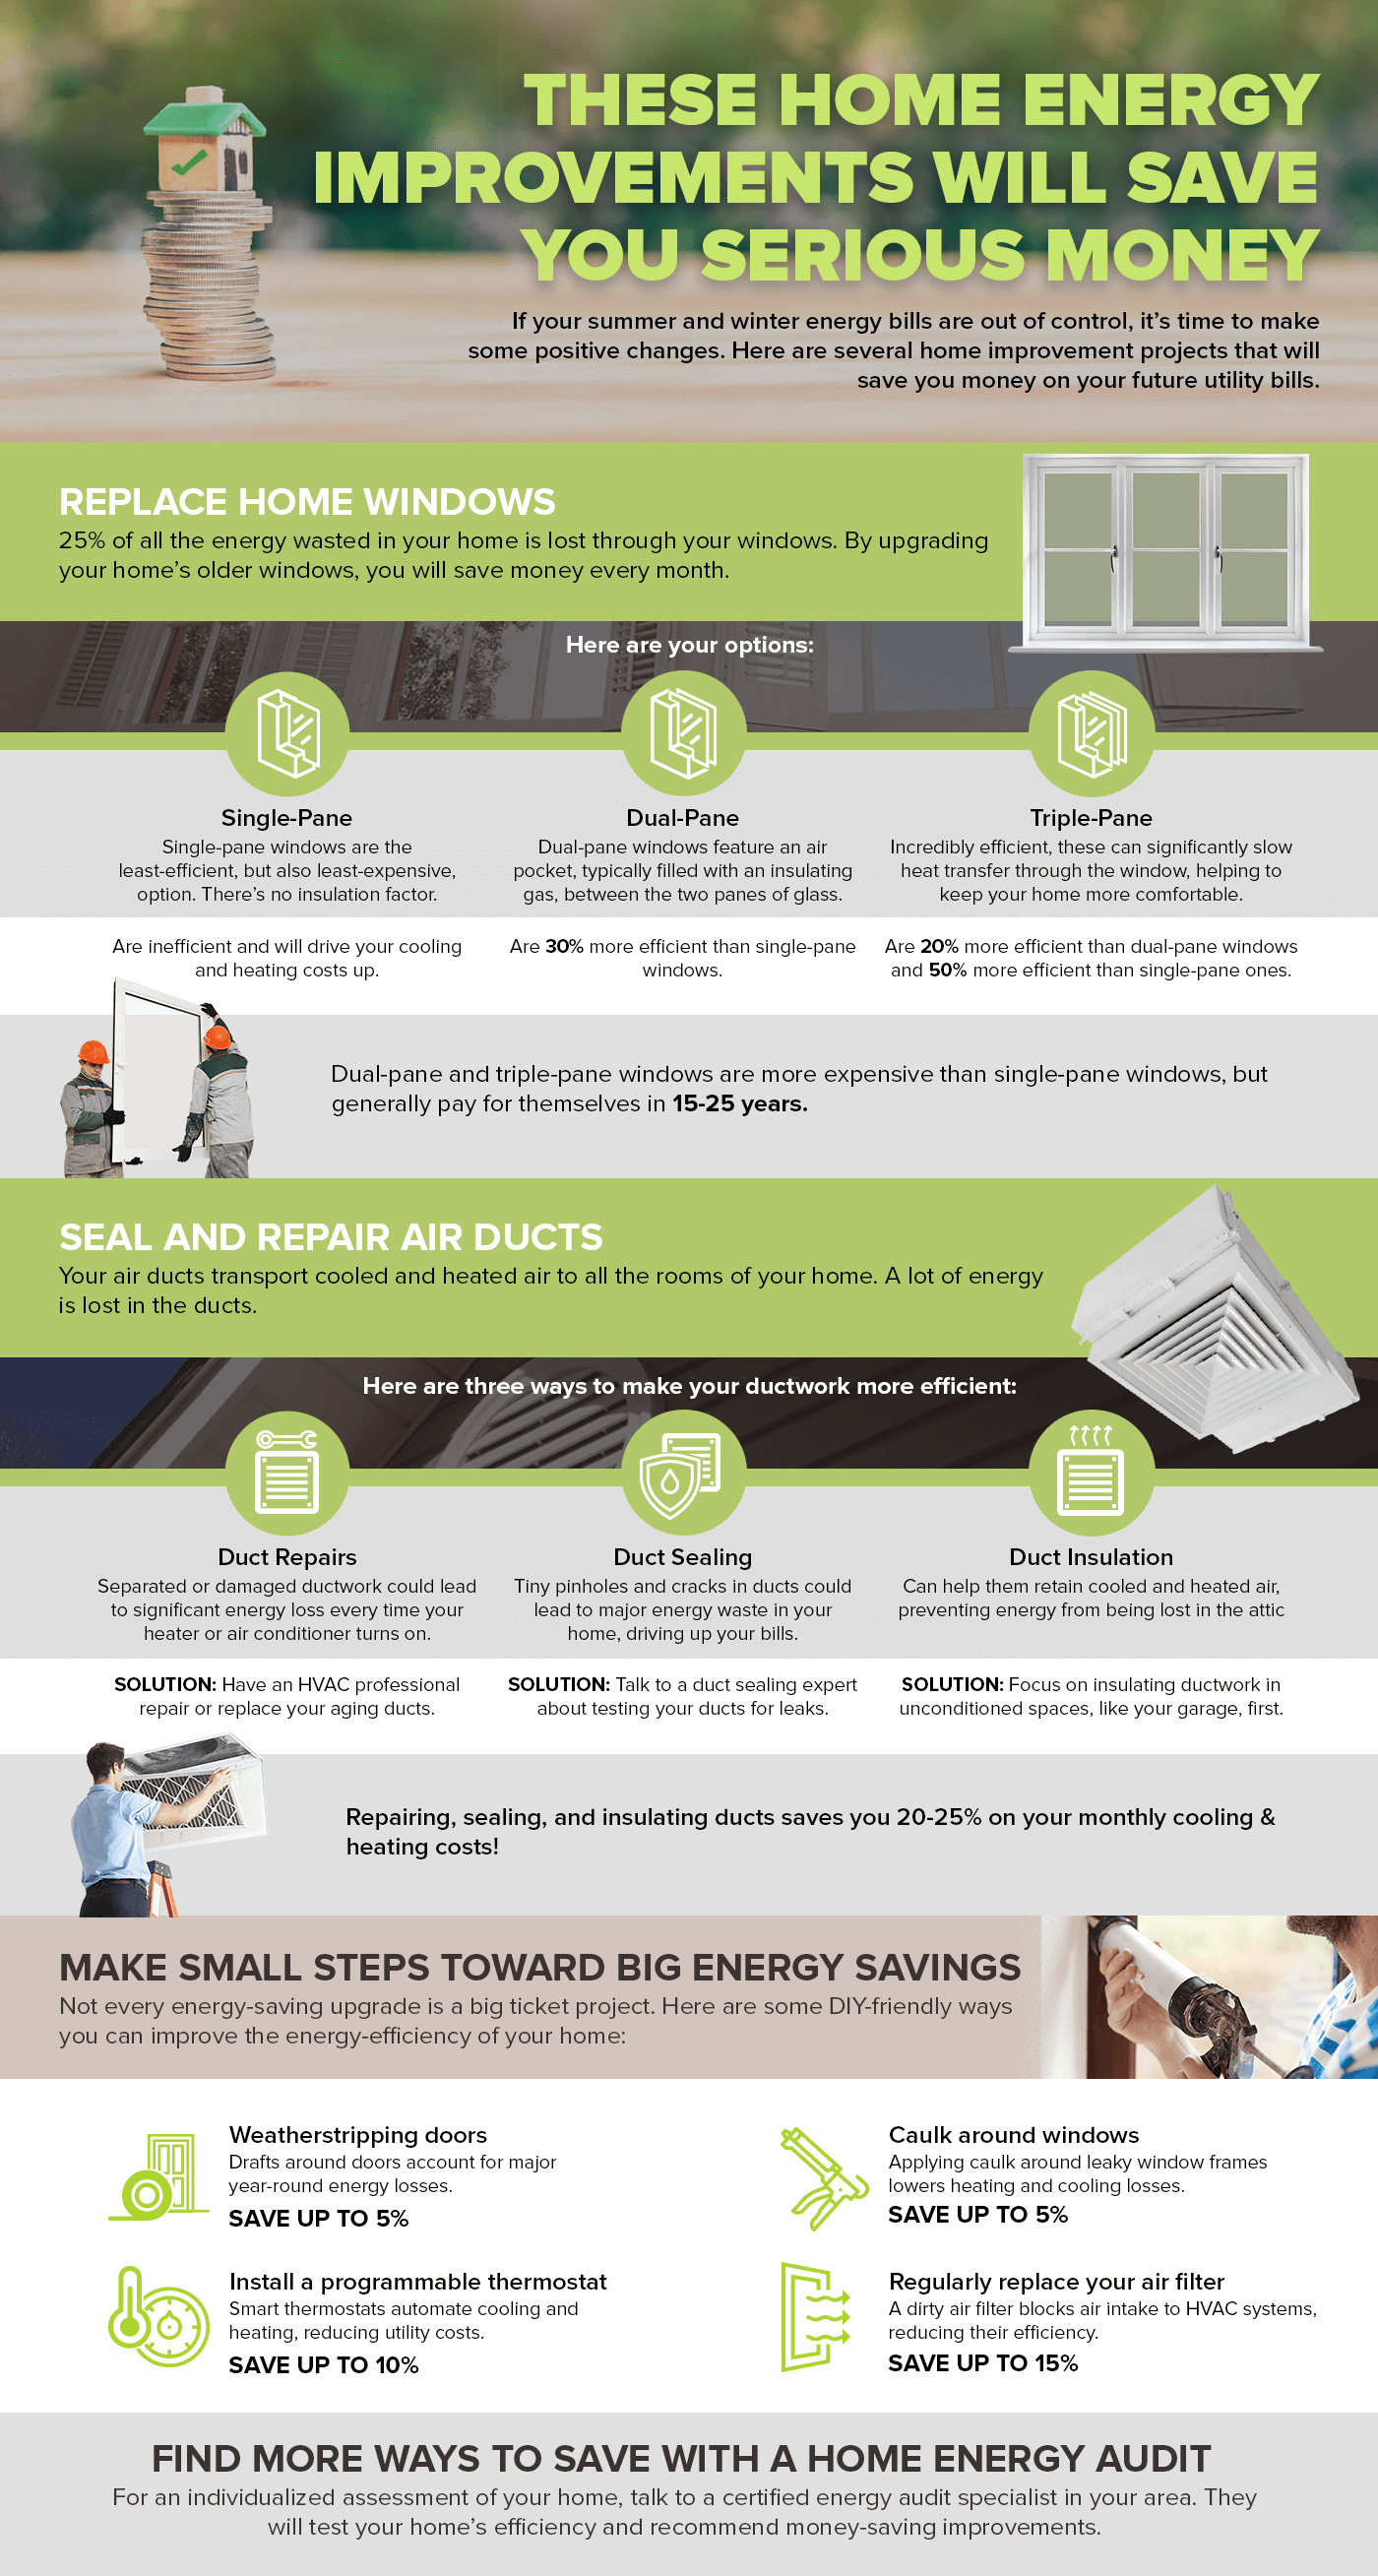 energy saving home improvements infographic